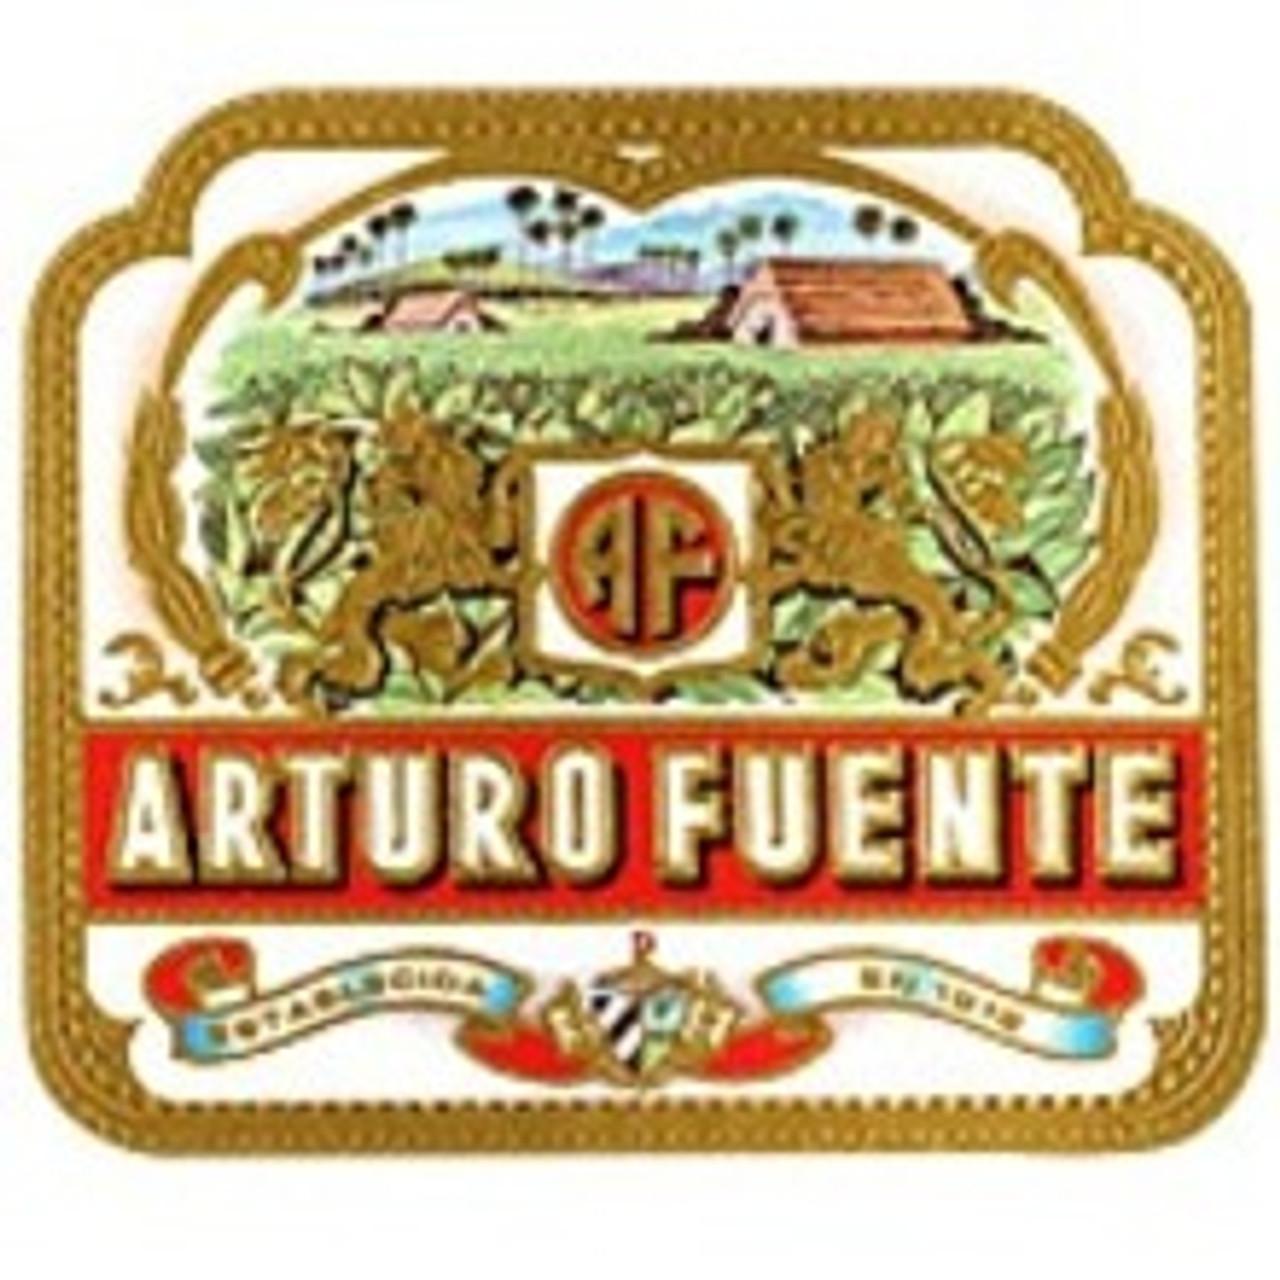 Arturo Fuente Spanish Lonsdale Maduro Cigars - 6 1/2 X 42 (Cedar Chest of 25)